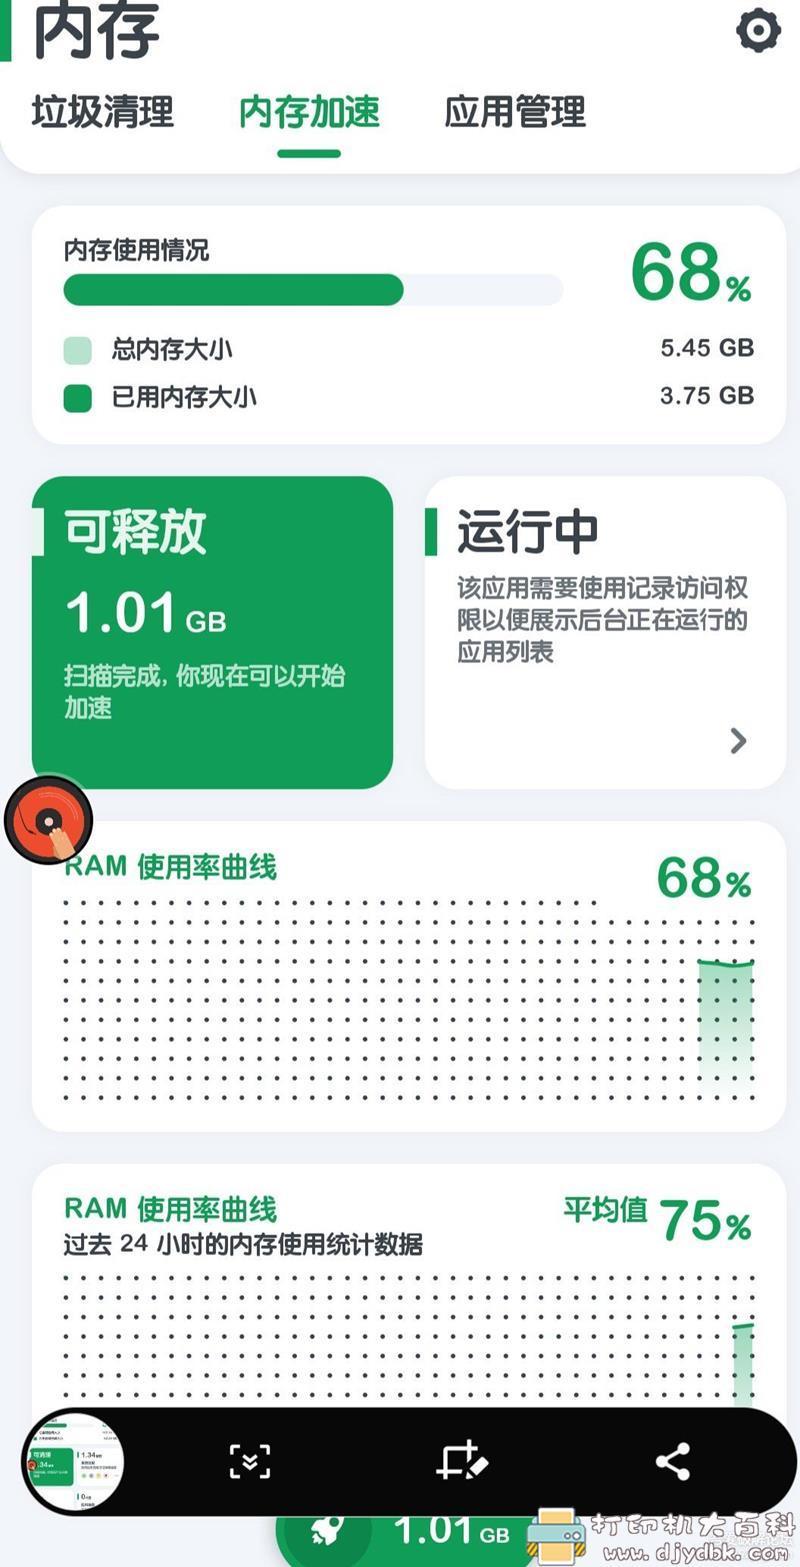 [Android]安卓清垃圾工具:强力清理8.3.5 配图 No.1